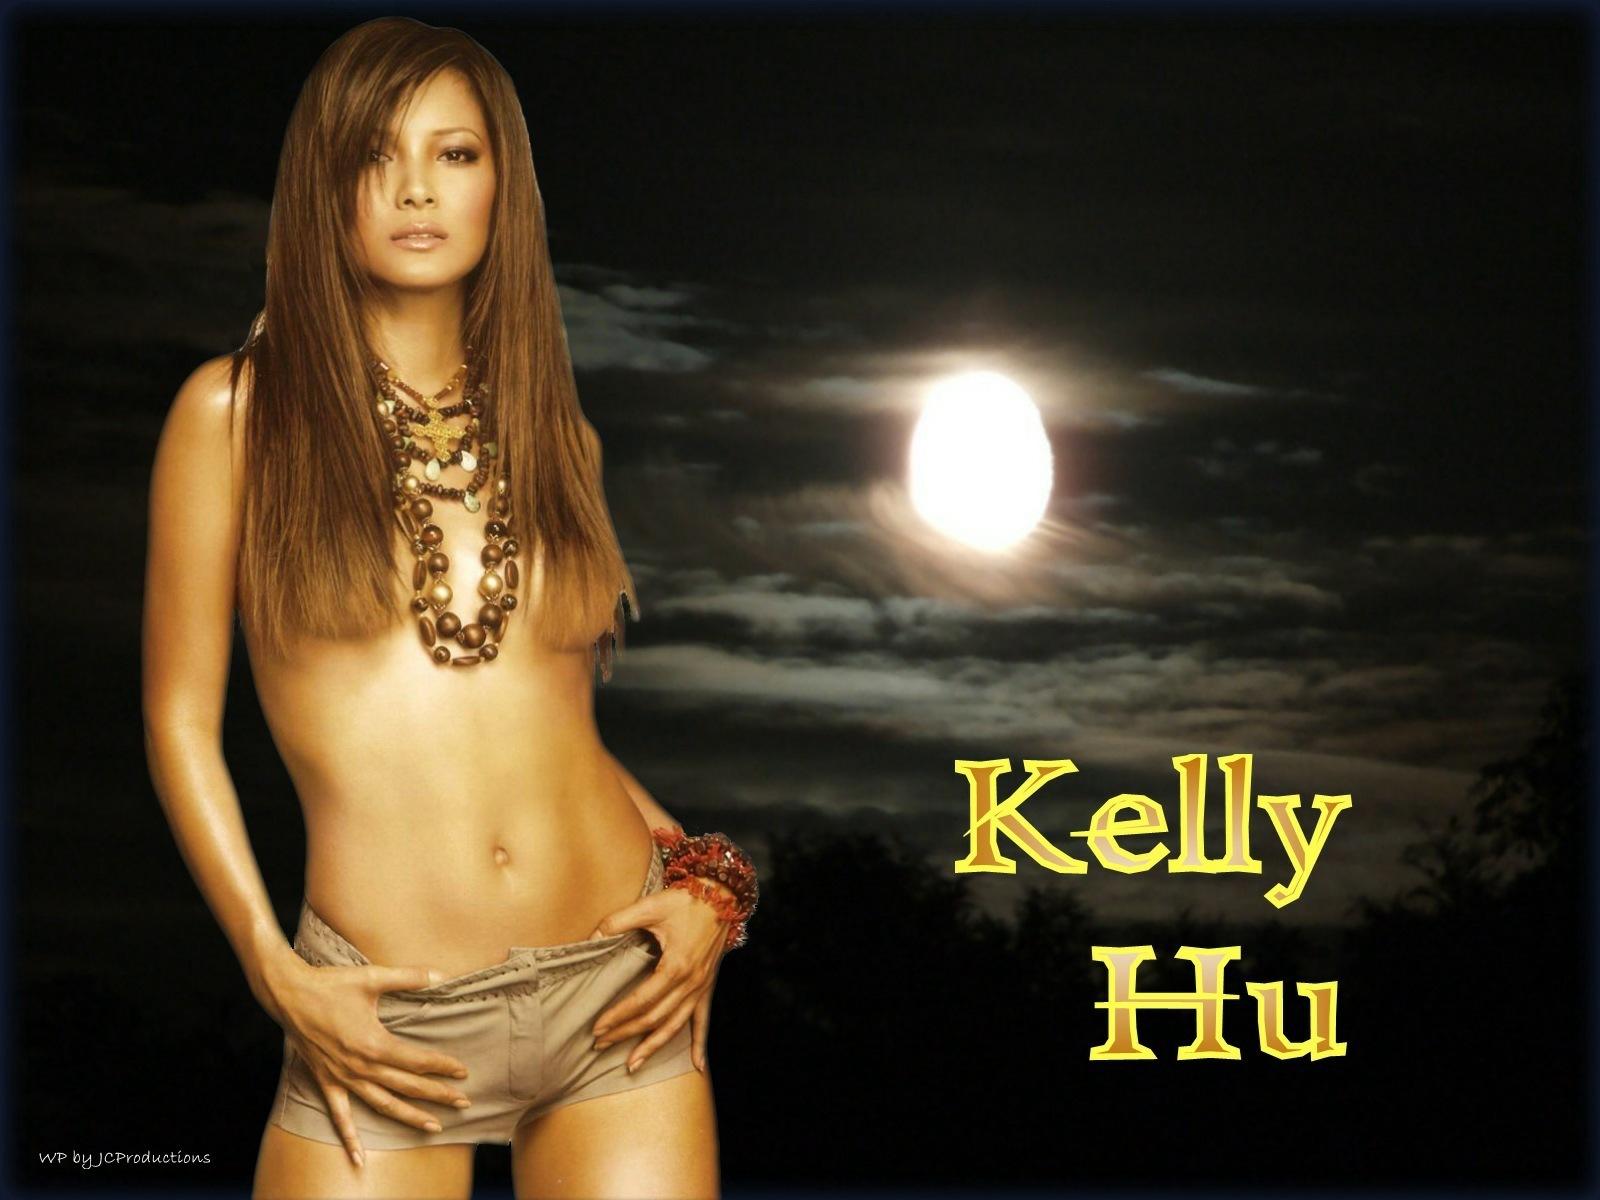 hu wallpaper Kelly blowjob